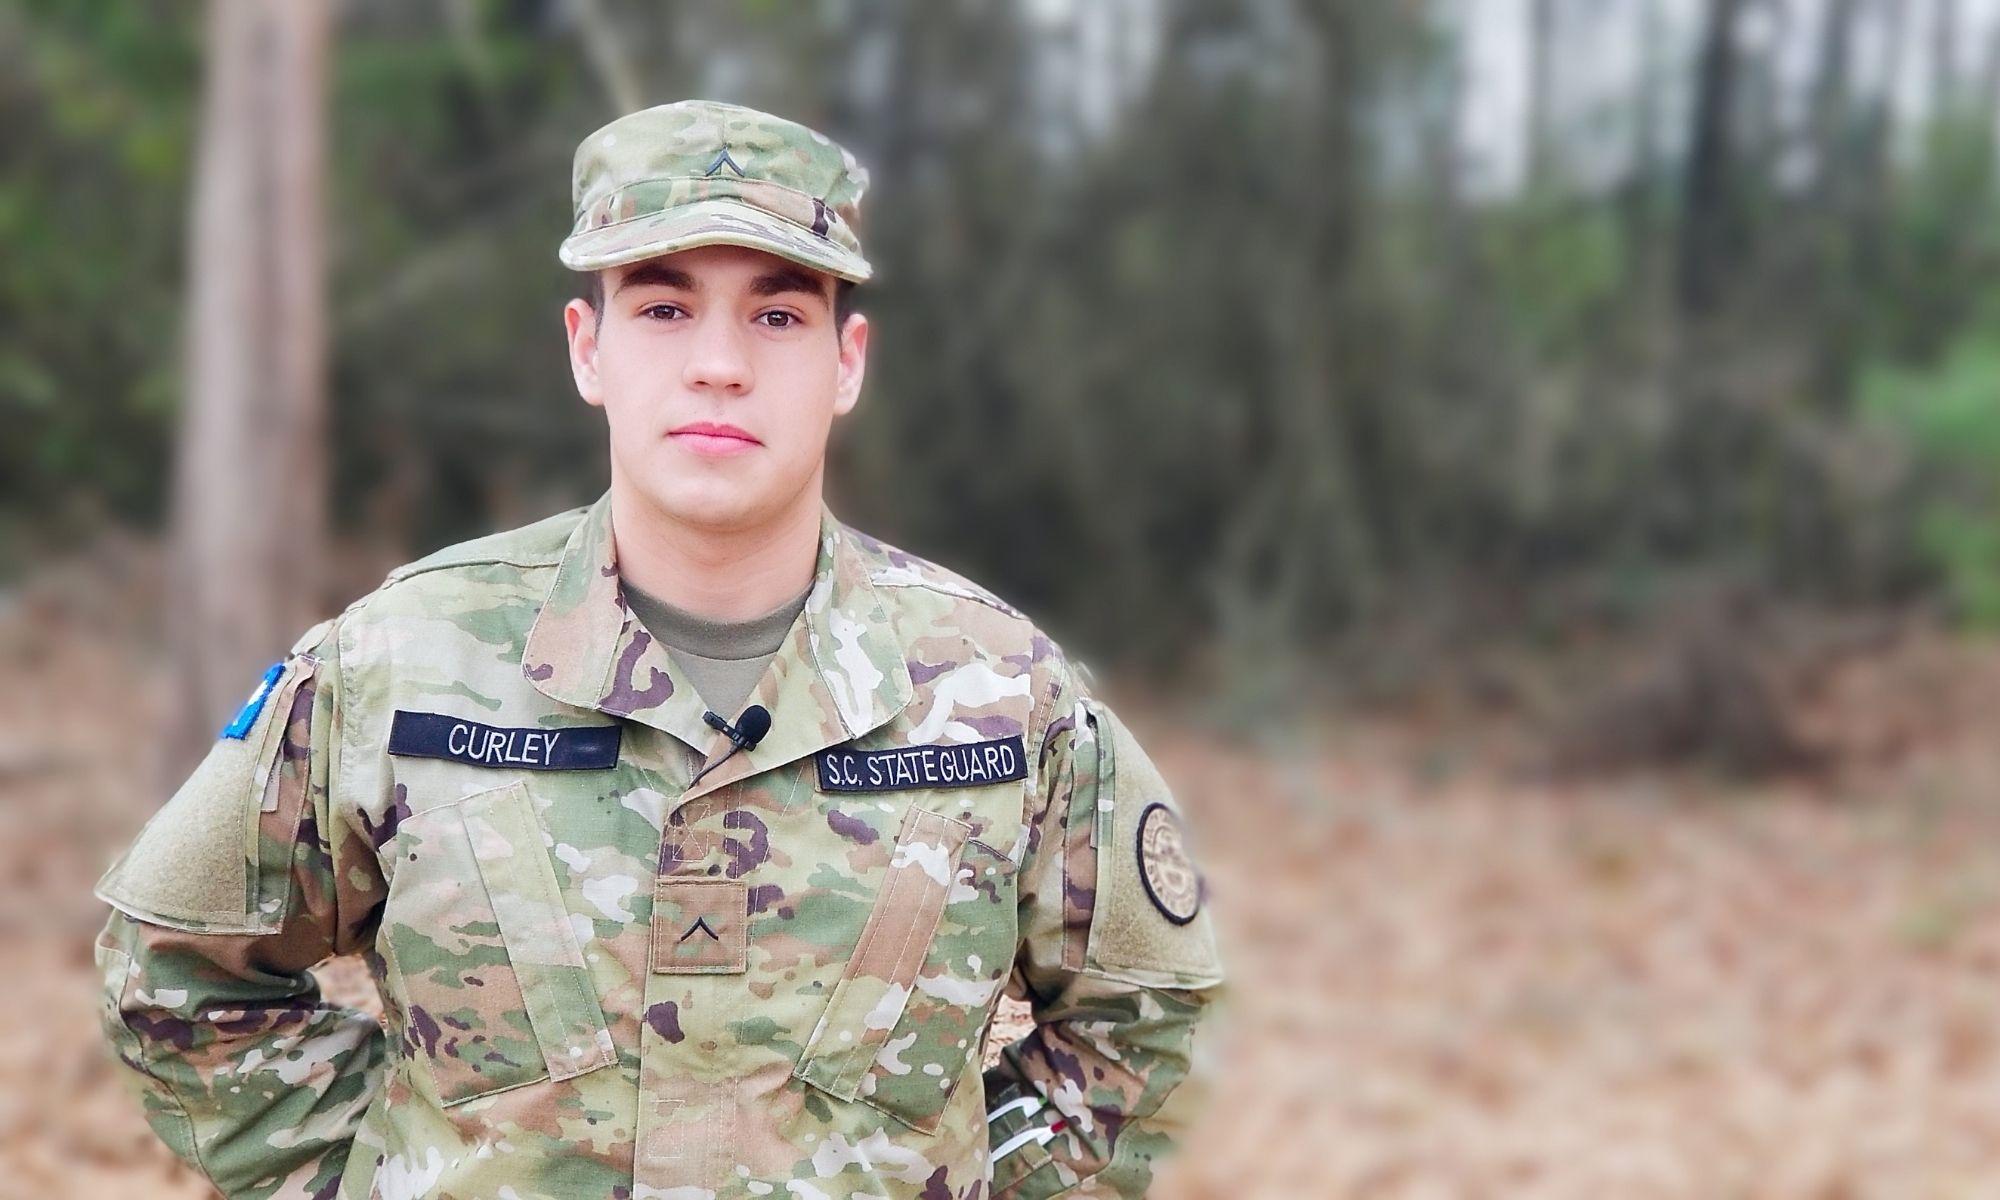 The South Carolina State Guard